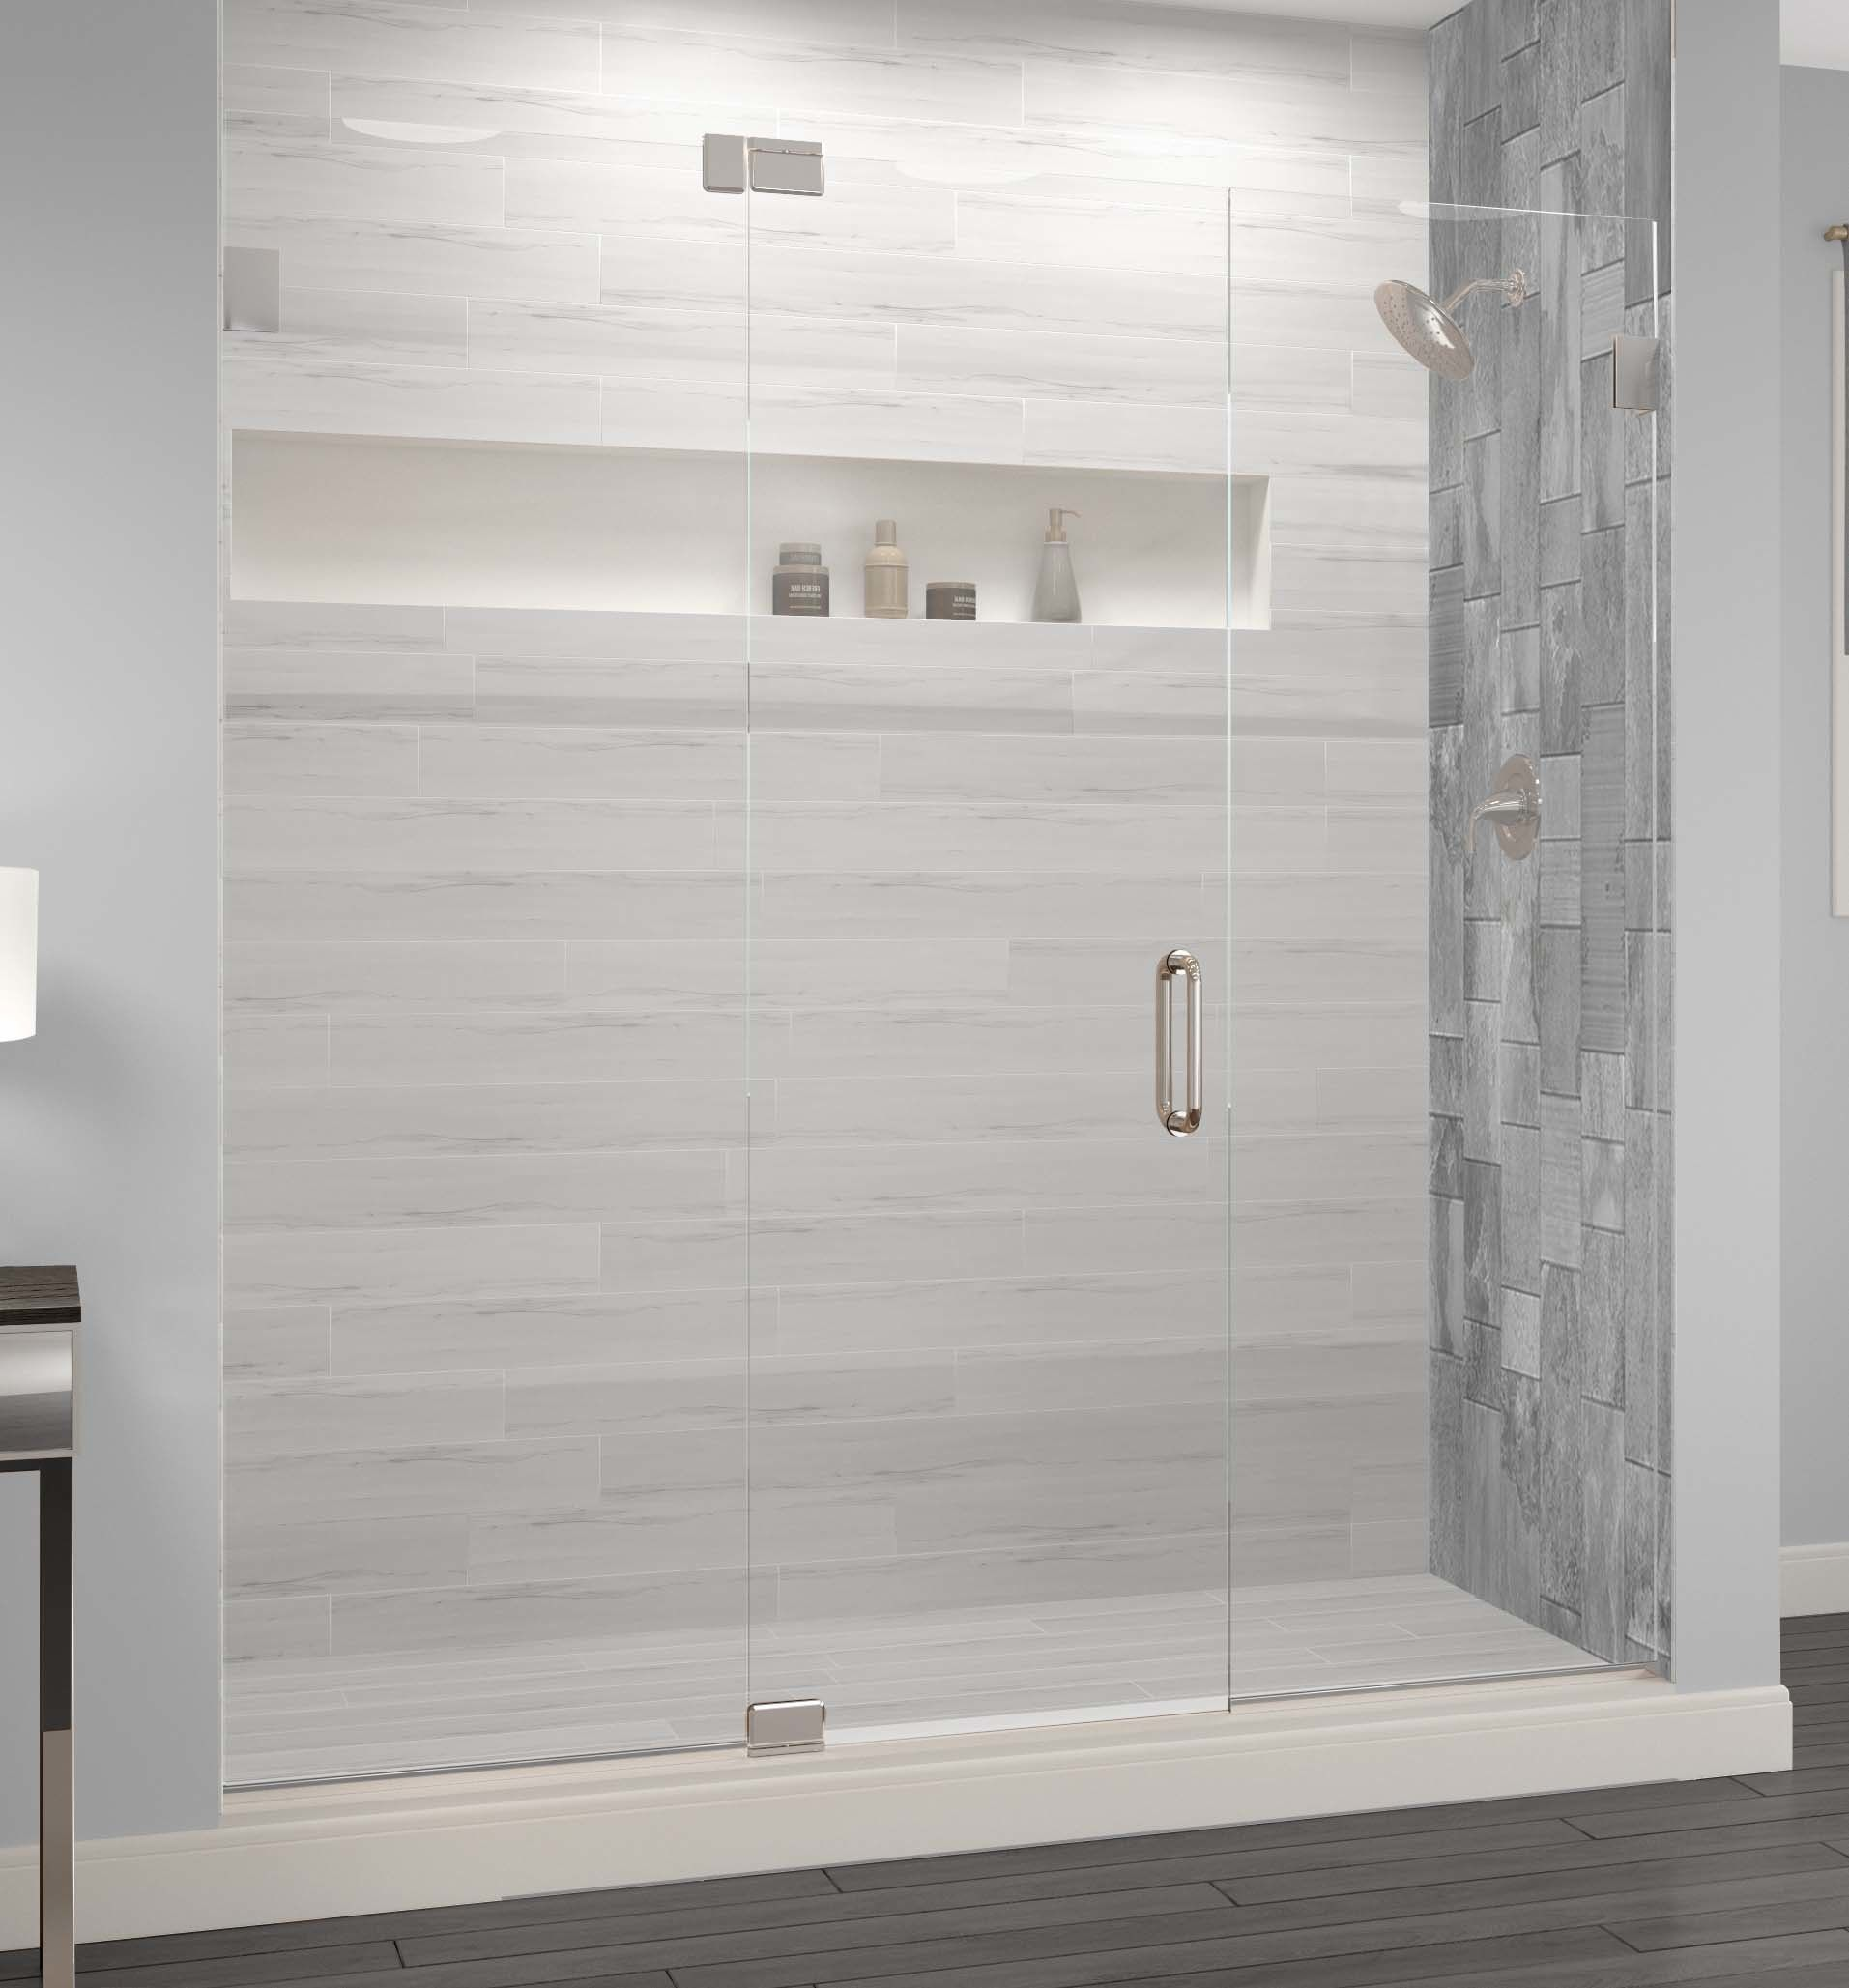 Celesta Frameless 3 8 Inch Glass Panel Swing Door Bathroom Shower Accessories Modern Shower Glass Shower Doors